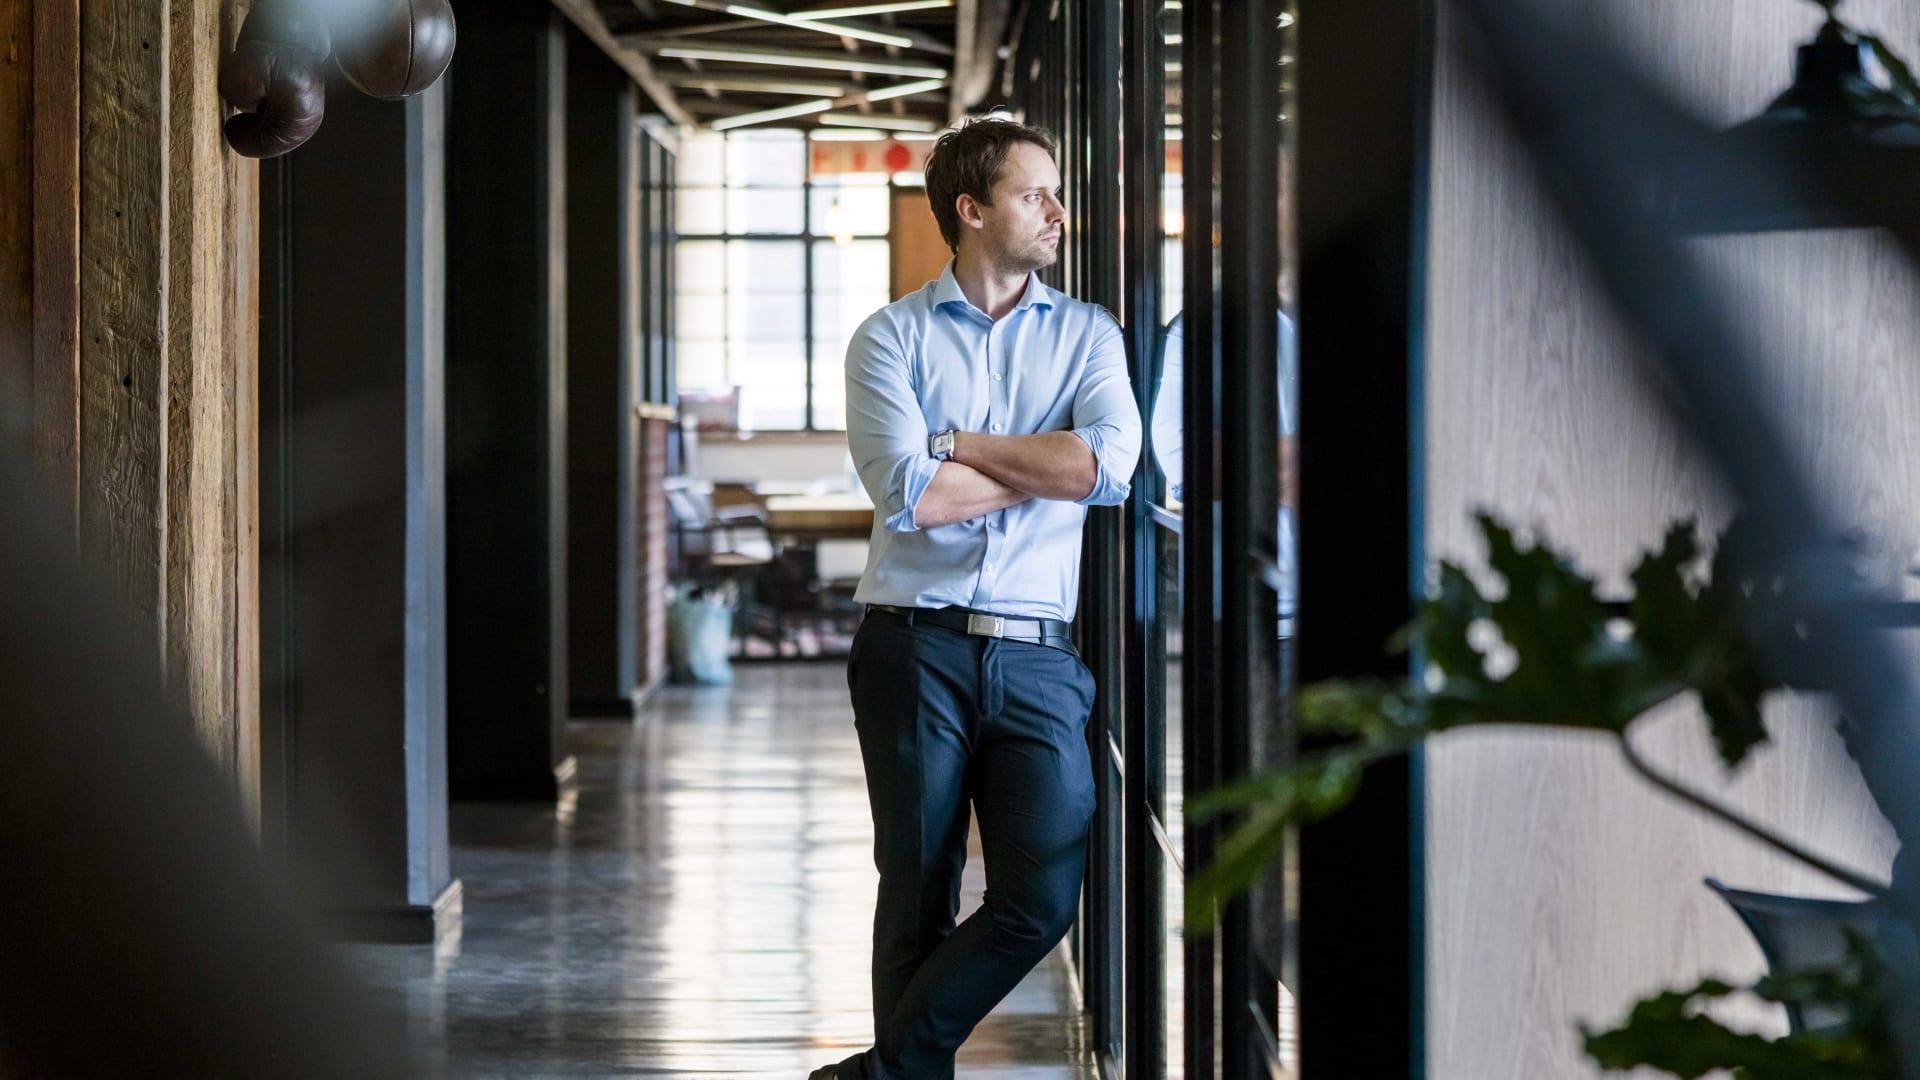 5 Ways to Exemplify Responsible Leadership